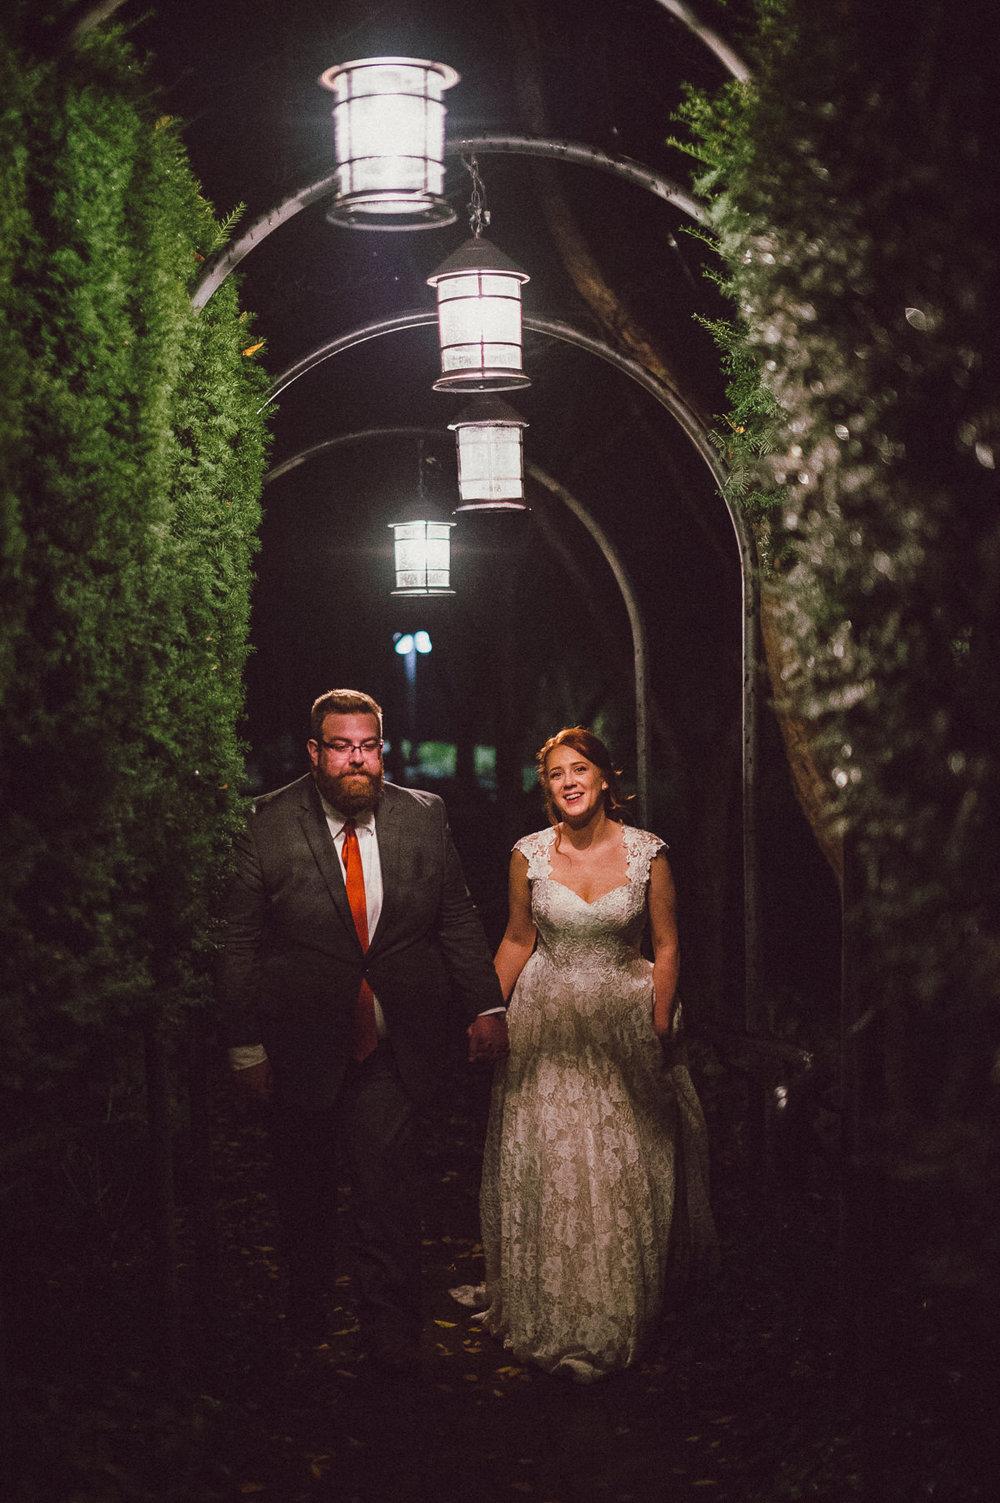 breighton-and-basette-photography-copyrighted-image-blog-amanda-and-eric-wedding-153.jpg